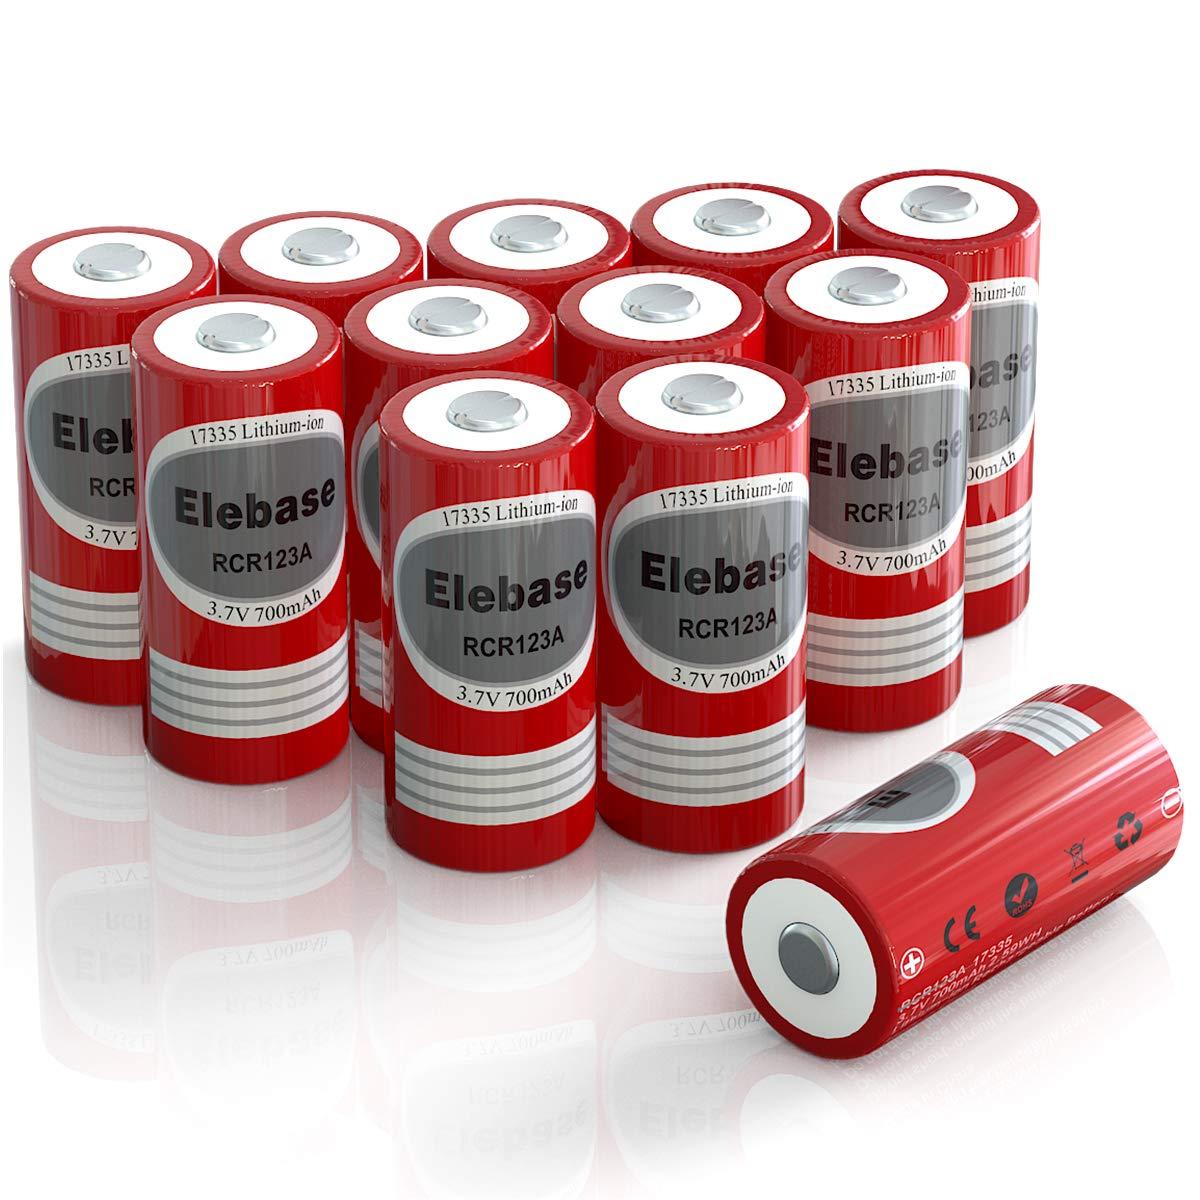 Elebase RCR123A Rechargeable Batteries, 12-Pack 3.7V 700mAh CR123A Rechargeable Batteries for Arlo Cameras (VMC3030/VMK3200/VMS3330/3430/3530) (Red)